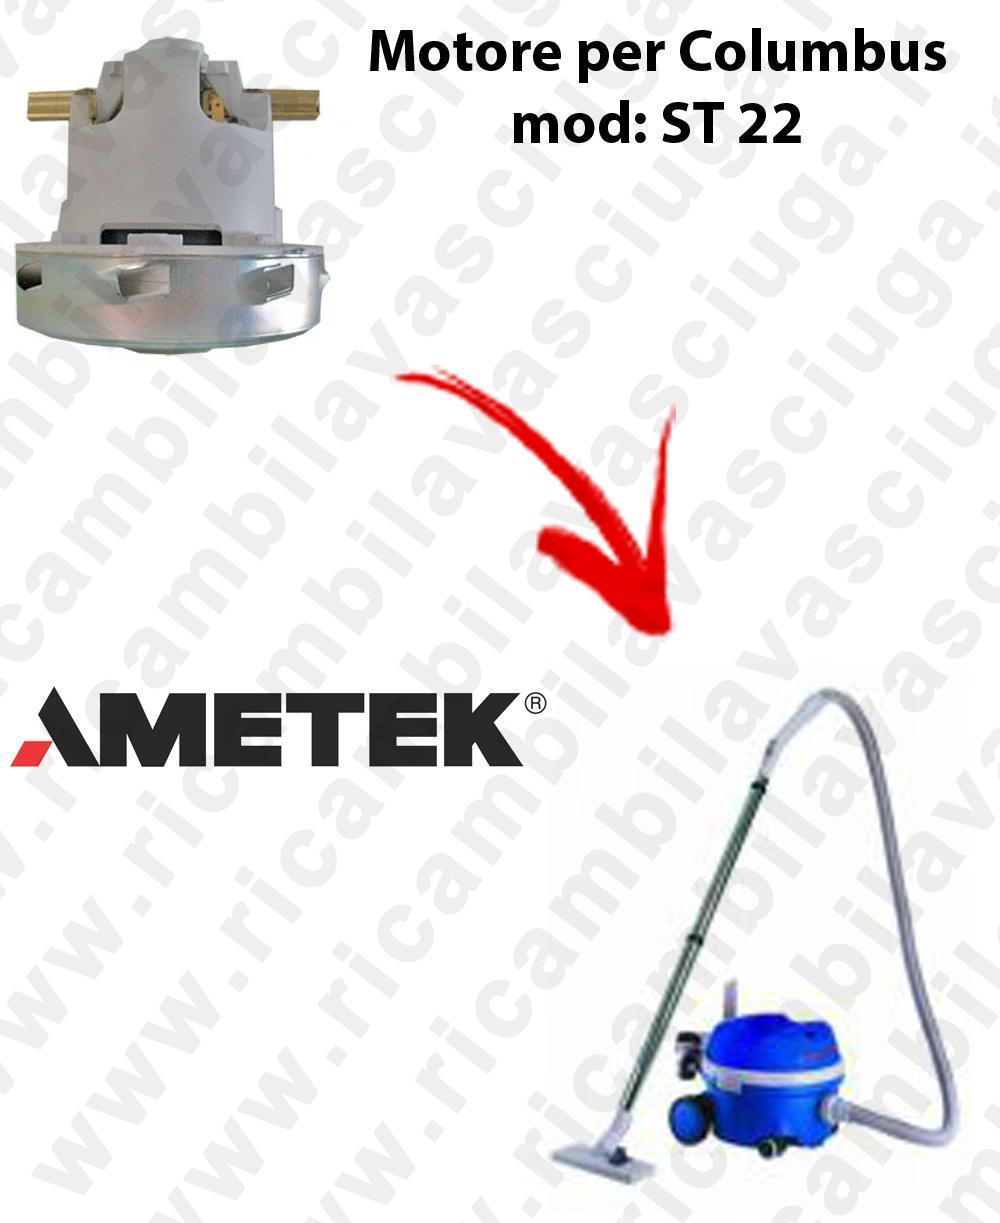 ST 22 Saugmotor AMETEK für Staubsauger COLUMBUS